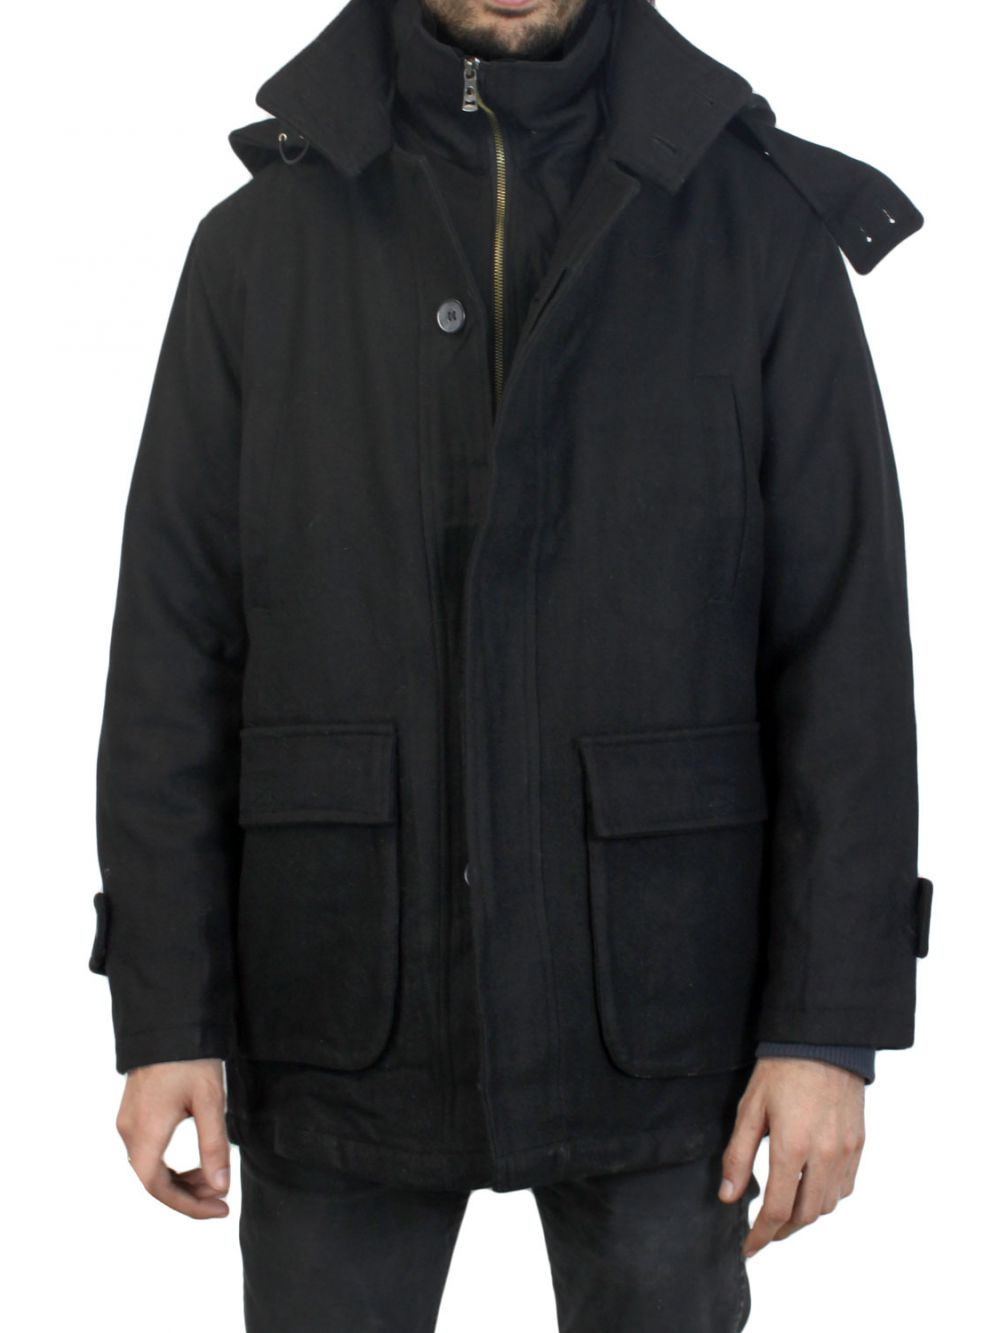 veste manteau homme noir ben 2 pas cher kebello com. Black Bedroom Furniture Sets. Home Design Ideas